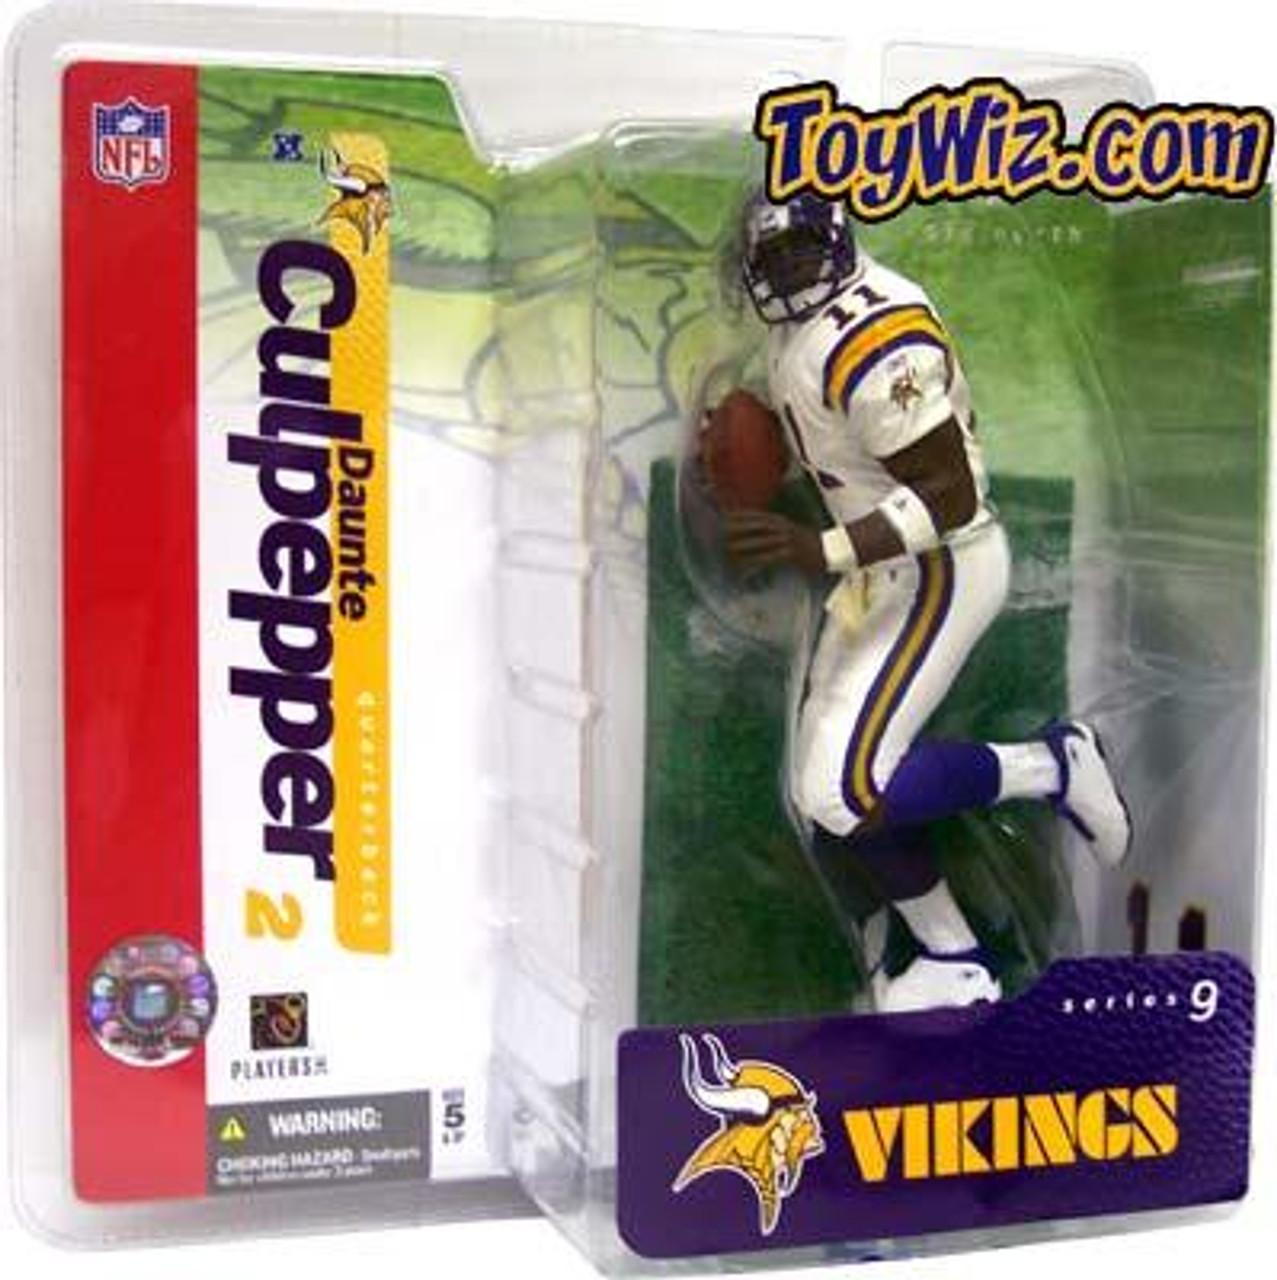 McFarlane Toys NFL Minnesota Vikings Sports Picks Series 9 Daunte Culpepper Action Figure [White Jersey Variant]